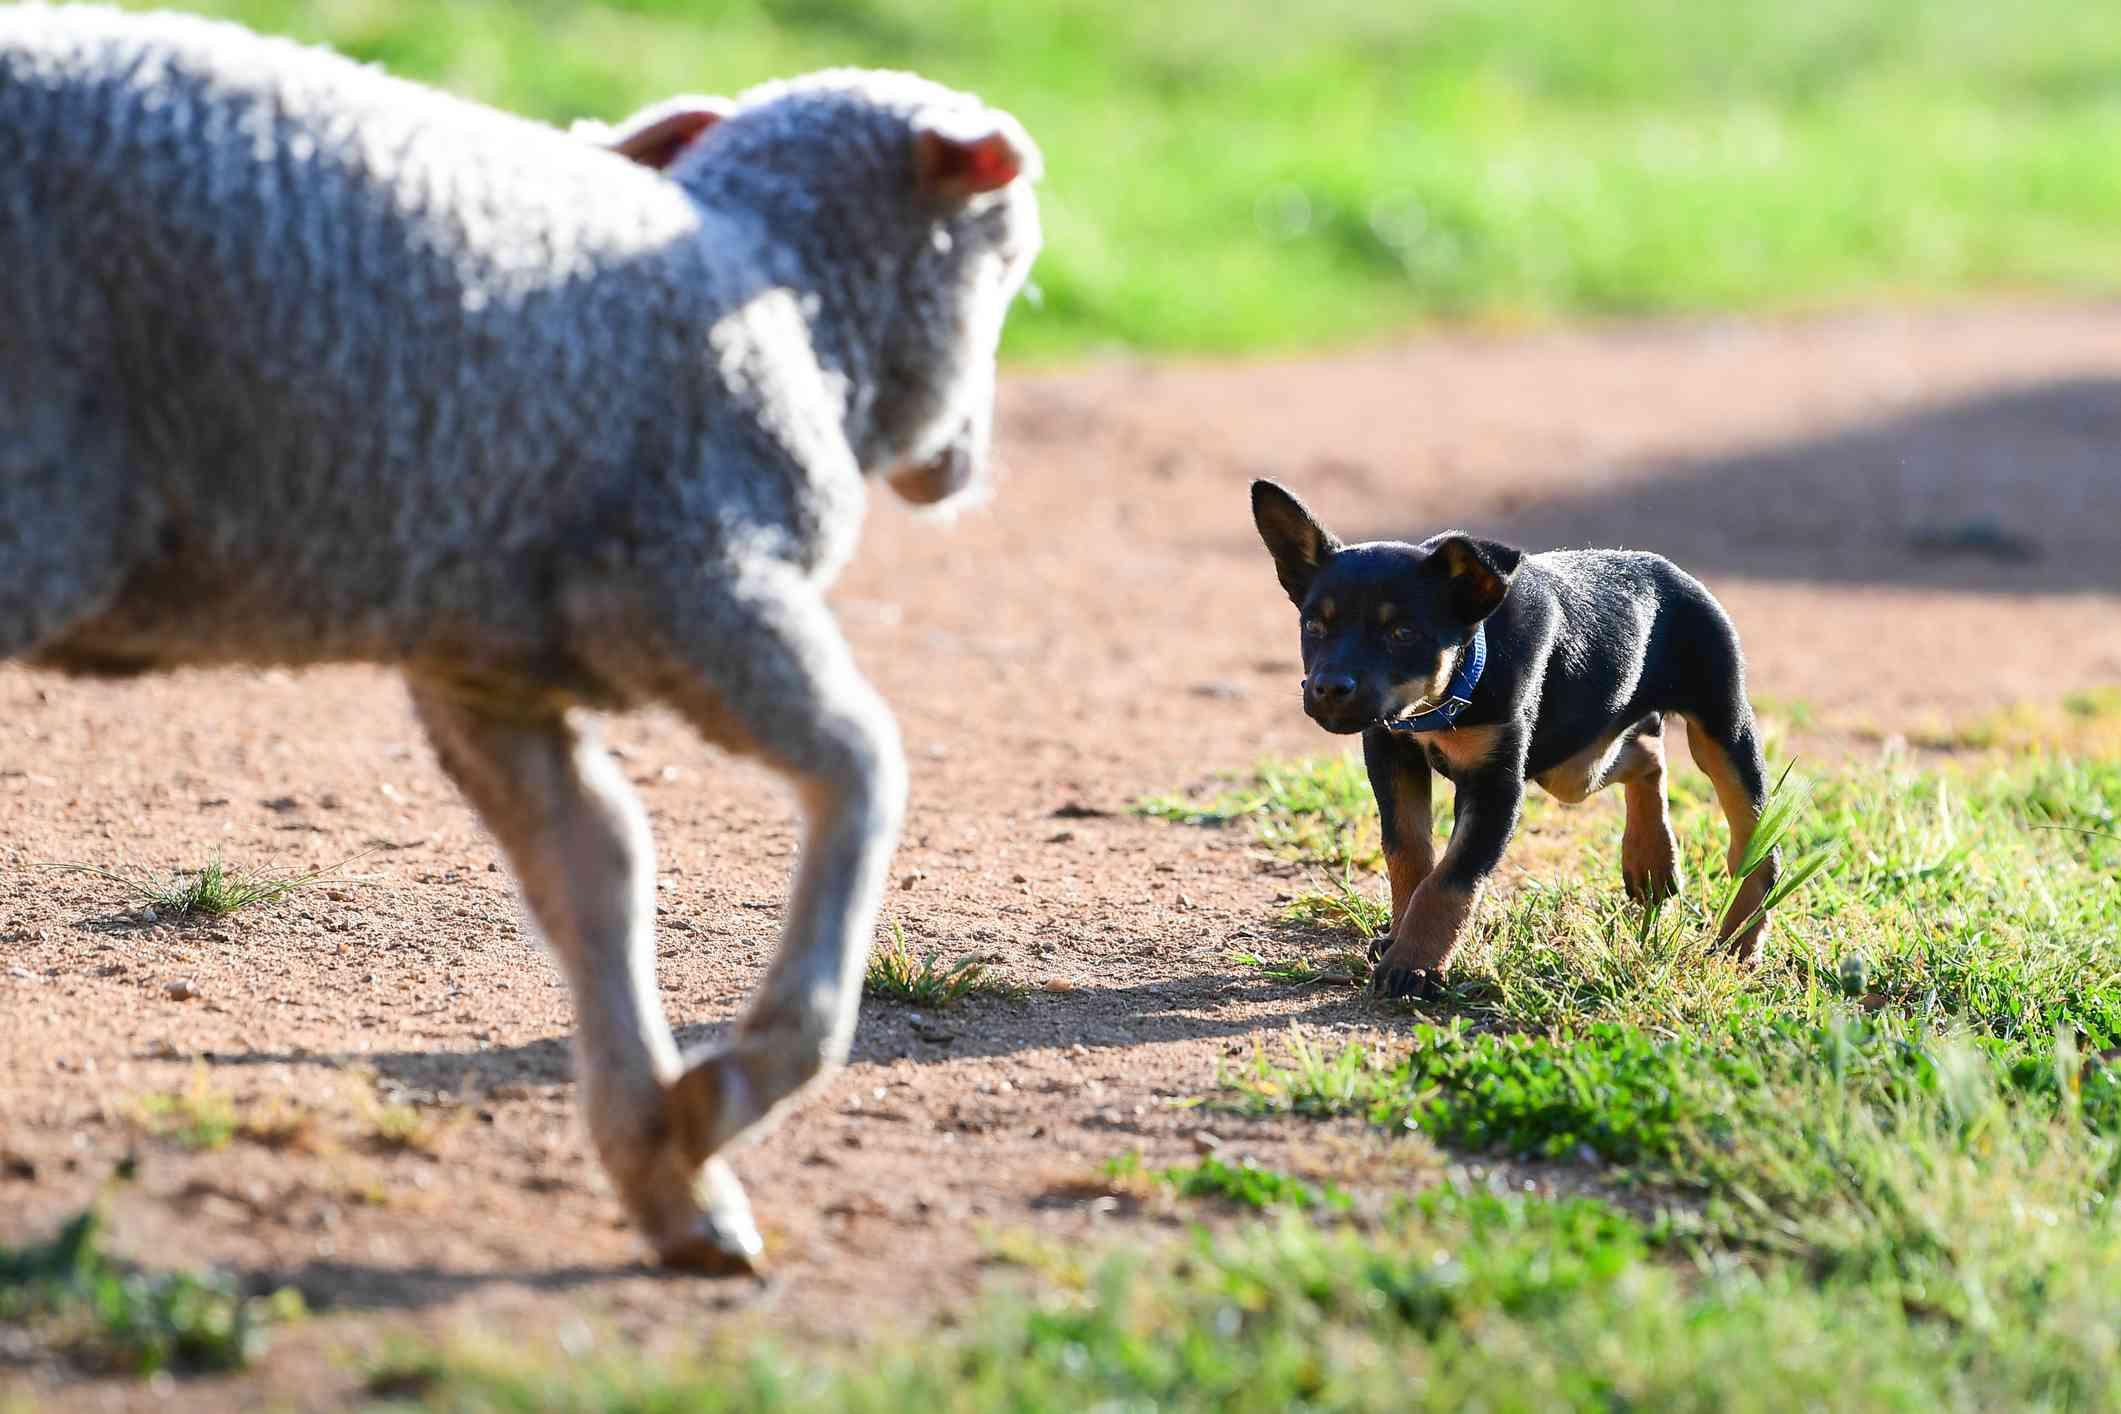 Australian Kelpie puppy herding sheep